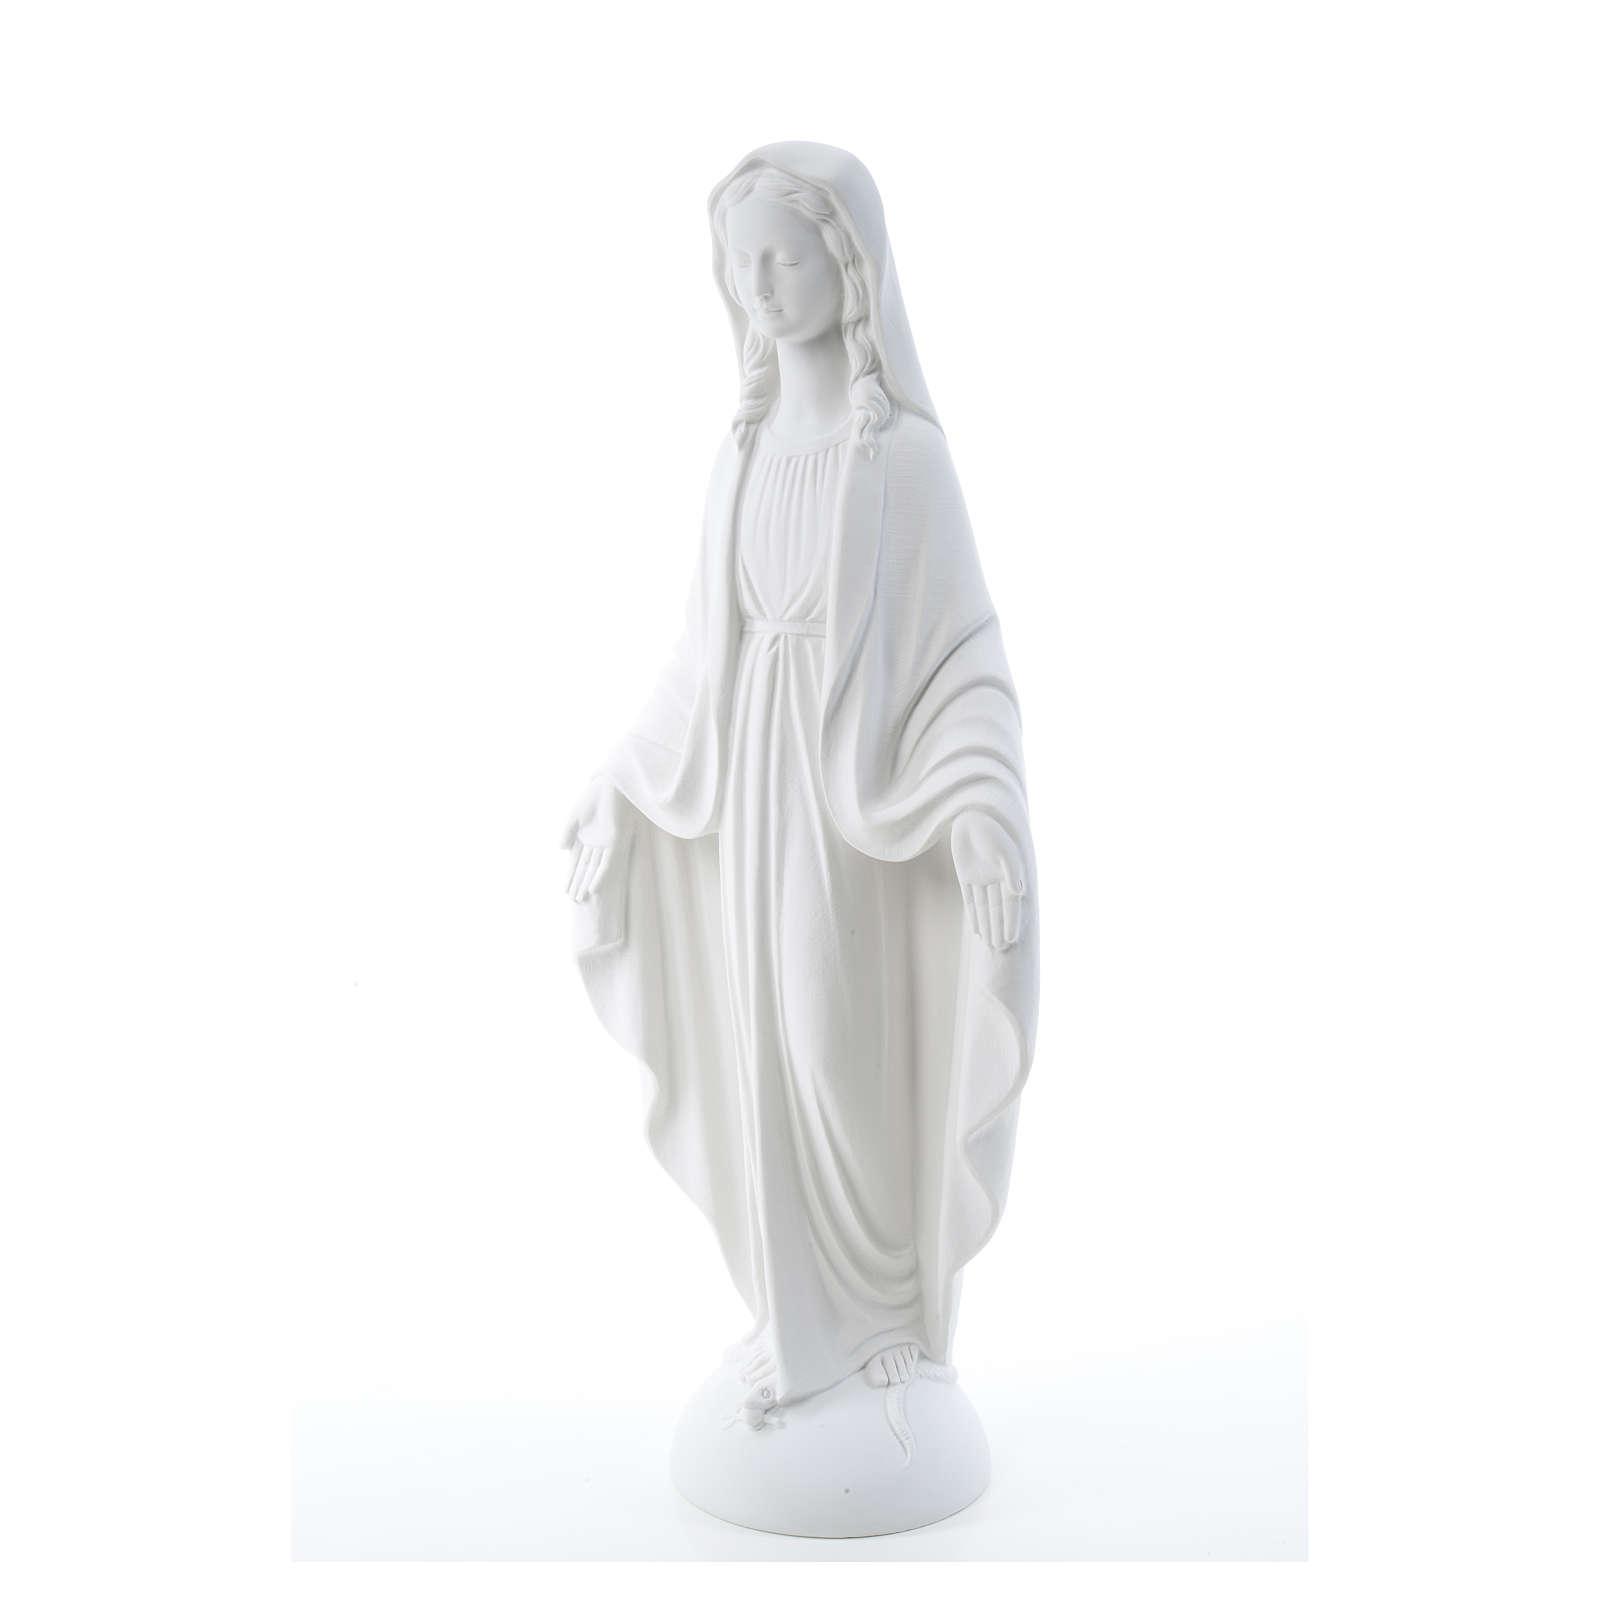 Statua Madonna Miracolosa marmo bianco 75 cm 4